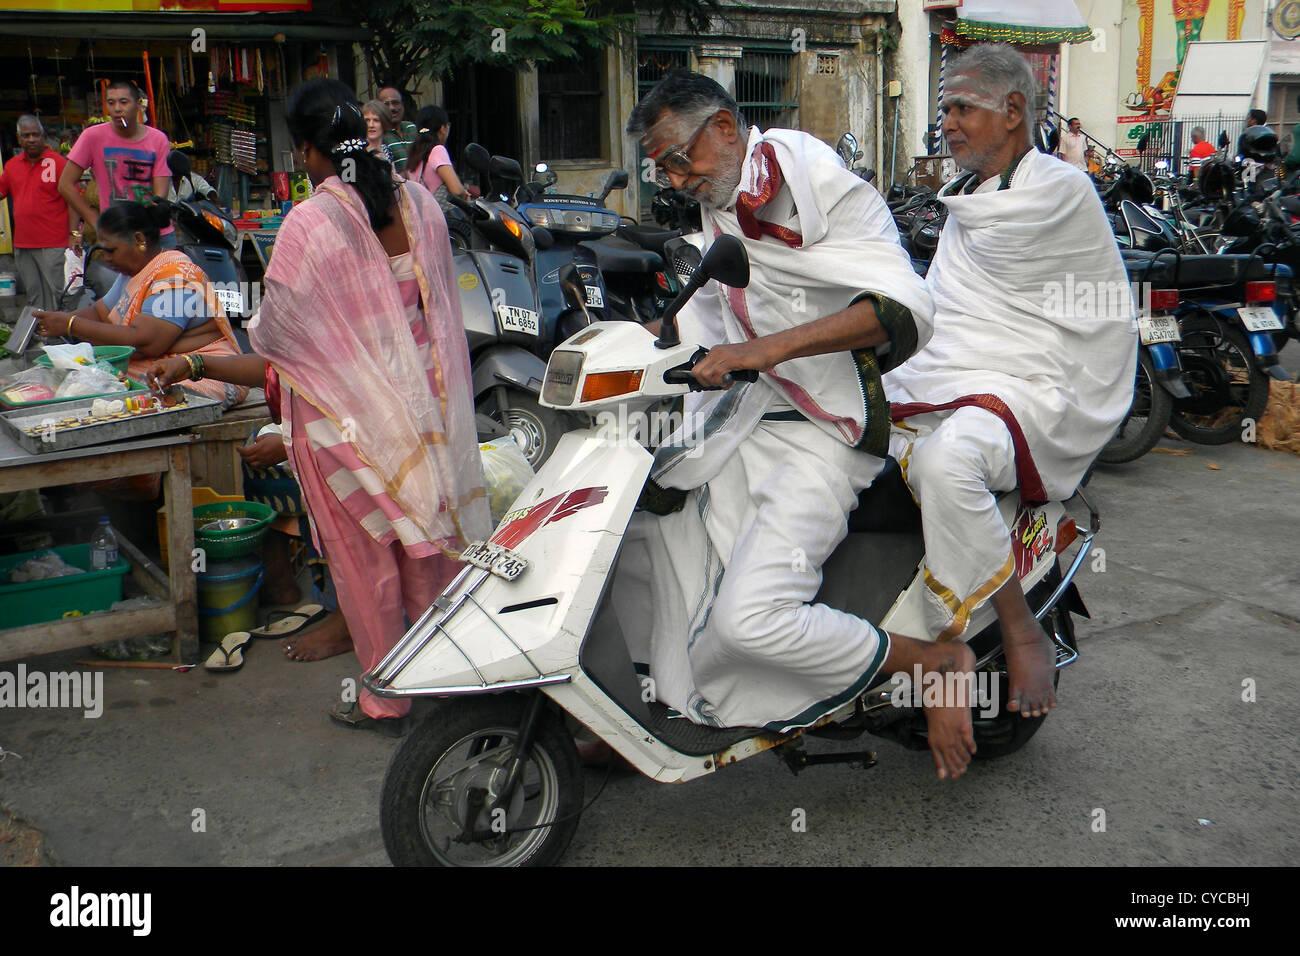 India, Tamil Nadu, Chennai, motorbike - Stock Image